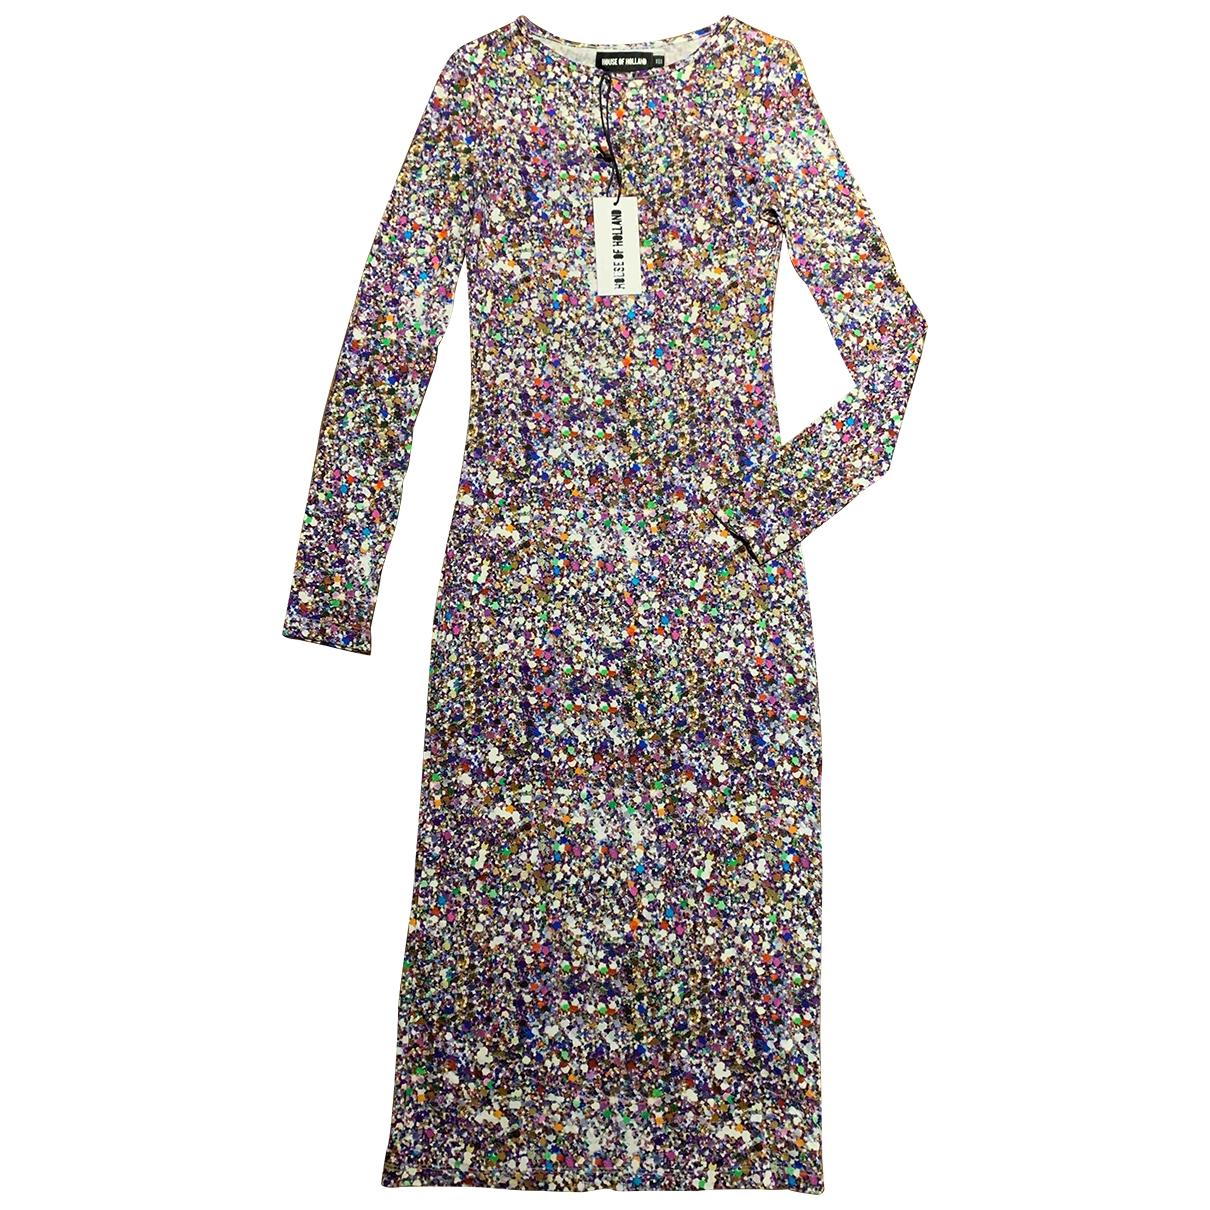 House Of Holland - Robe   pour femme en coton - elasthane - multicolore